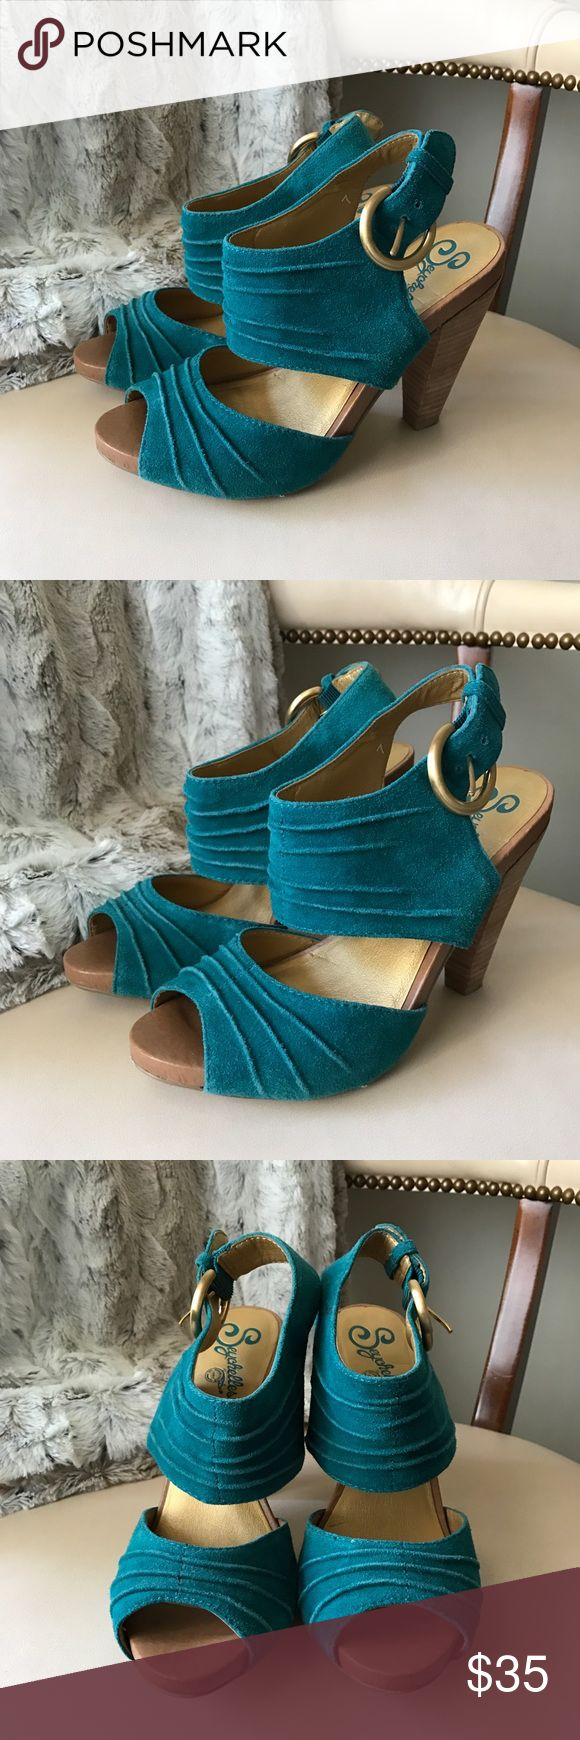 Best 25 Turquoise Heels Ideas On Pinterest Sexy Heels